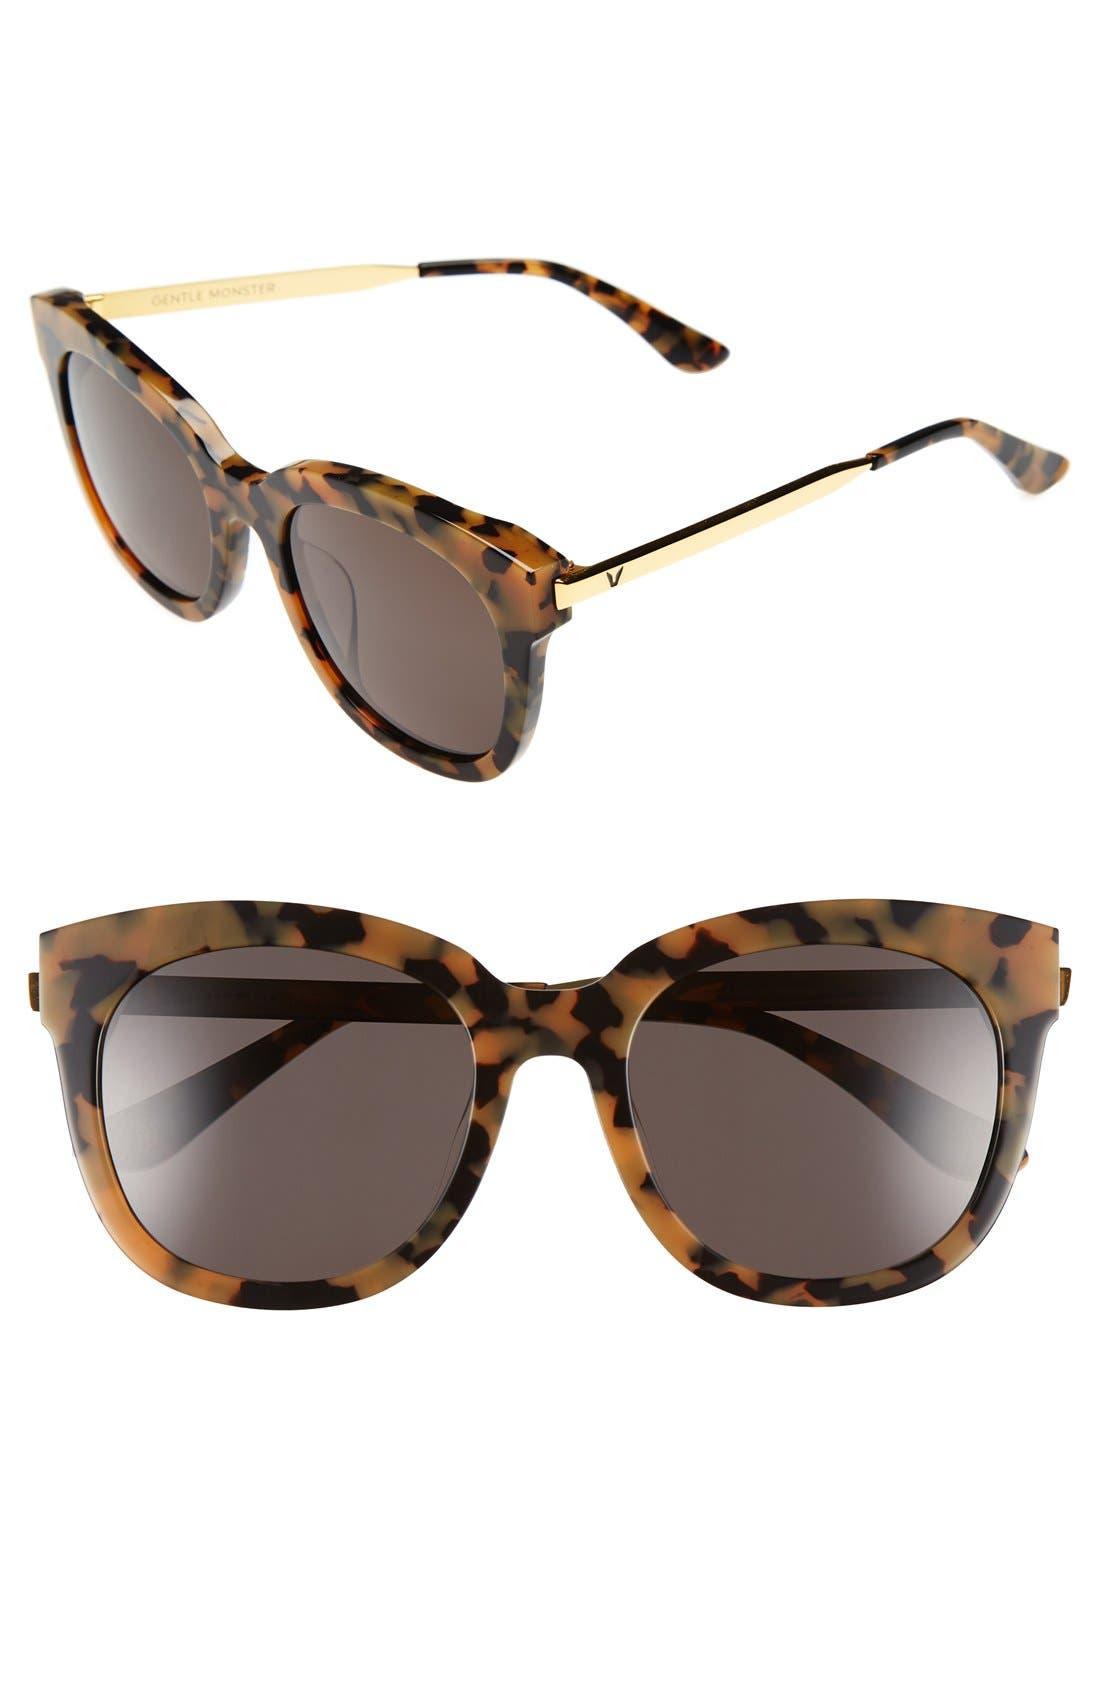 Gentle Monster 'Cuba' 55mm Sunglasses